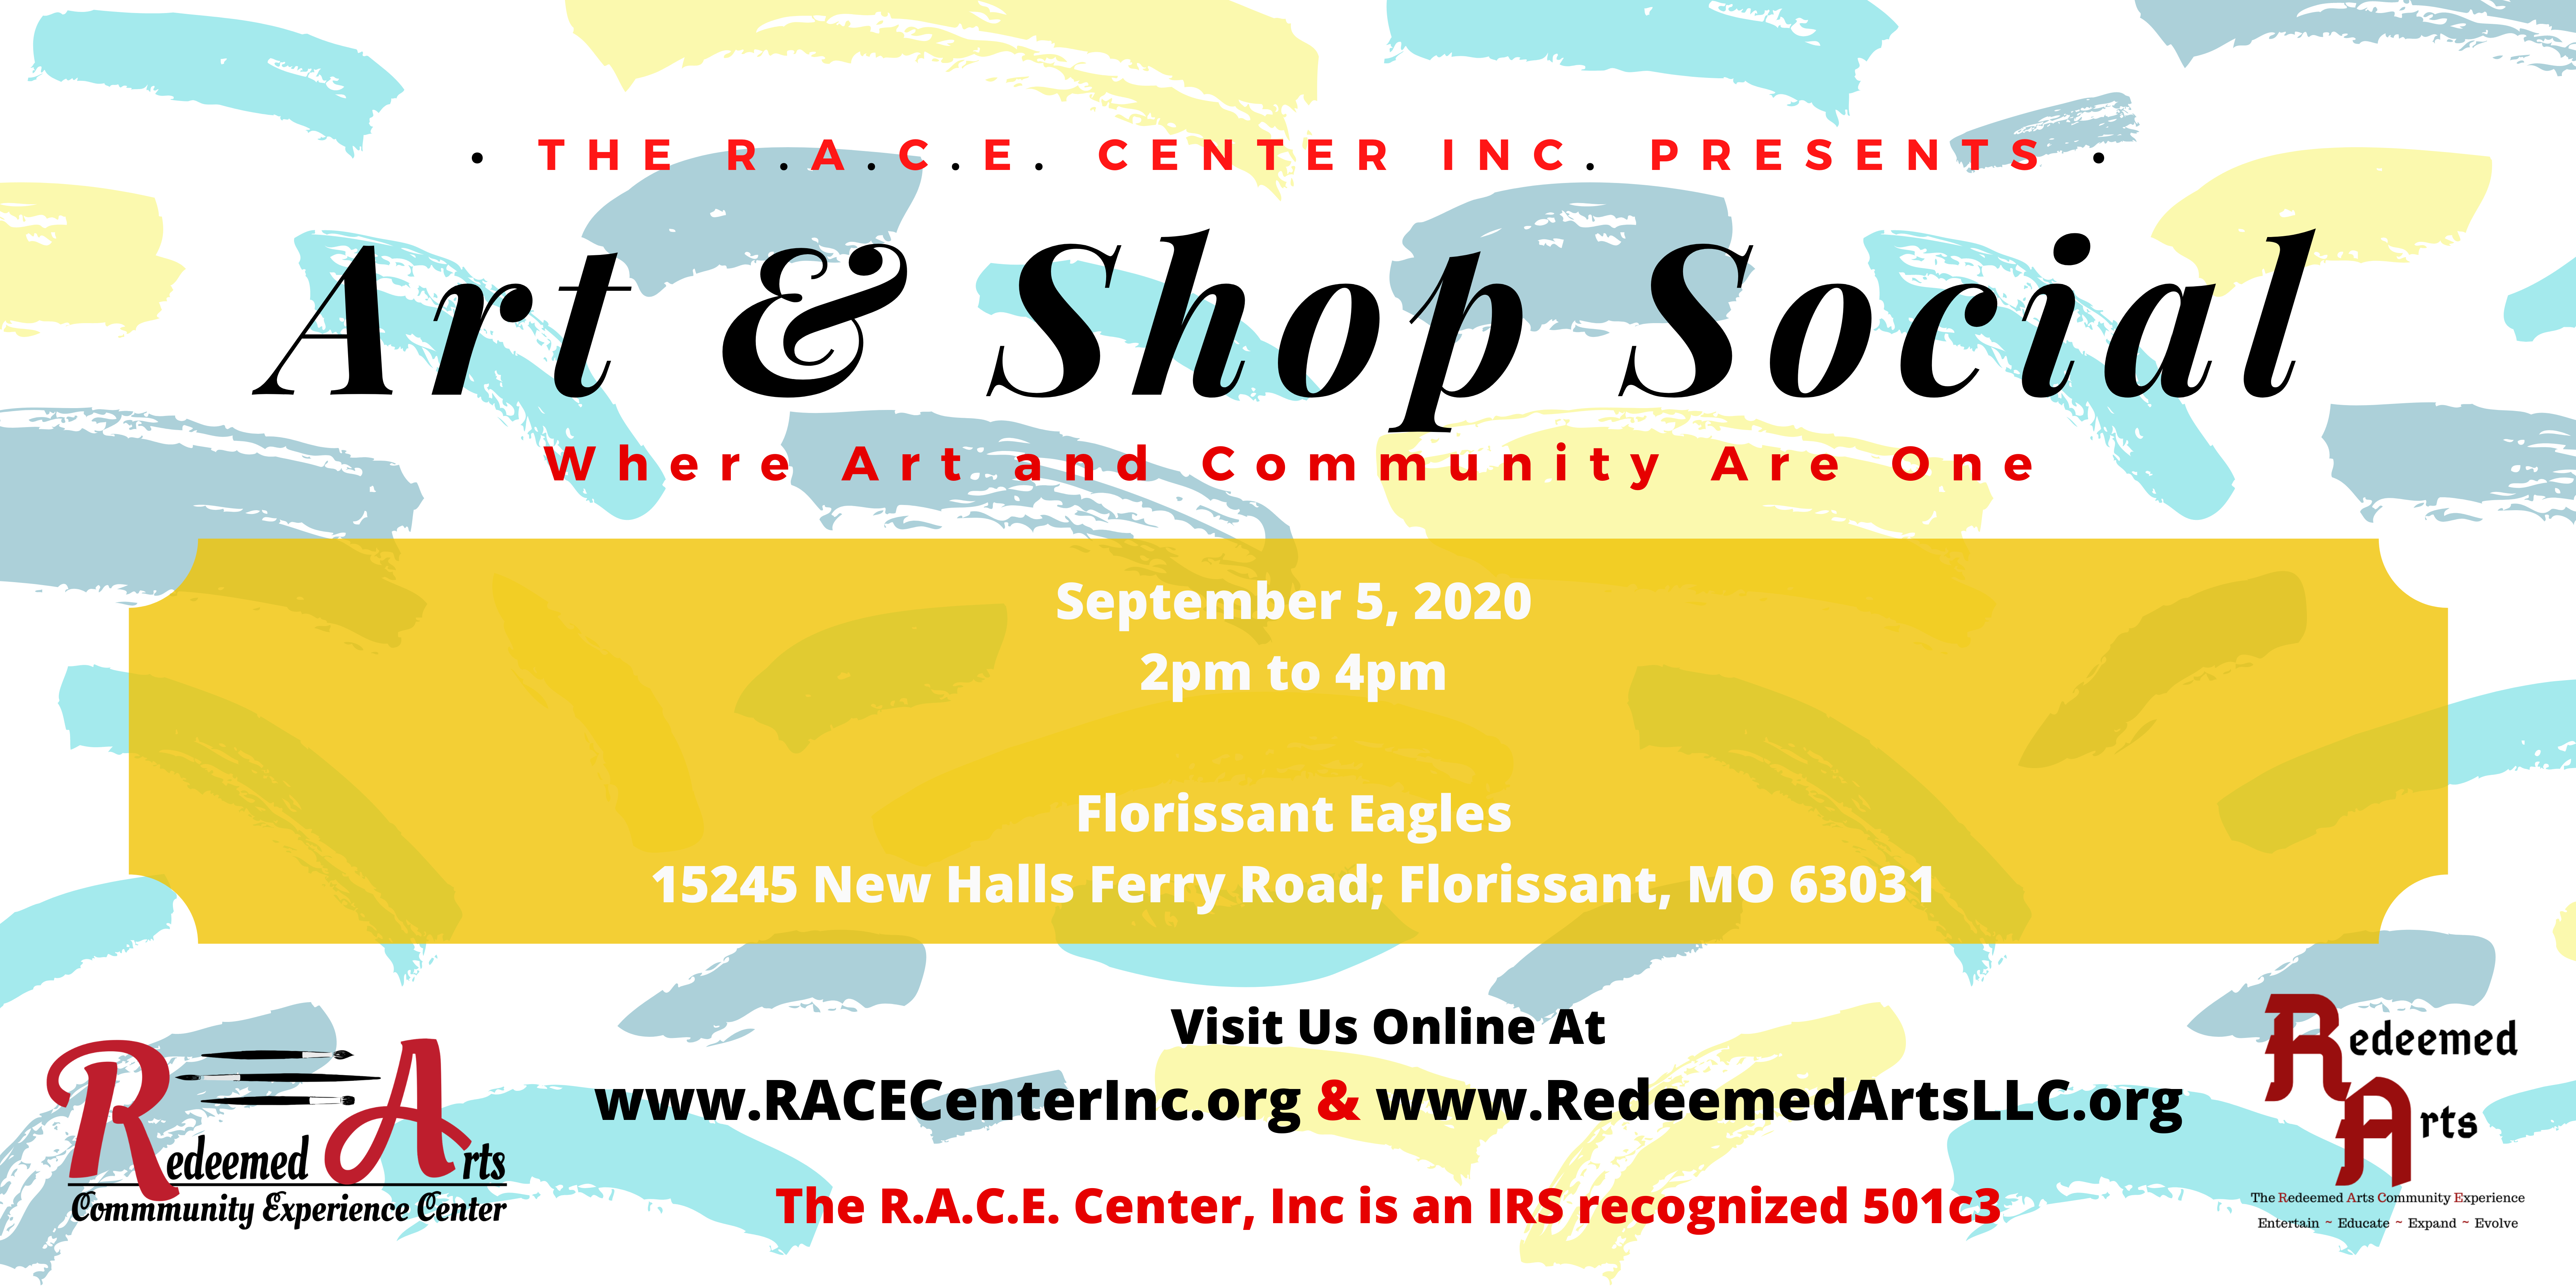 Art & Shop Social with Date MEDIUM